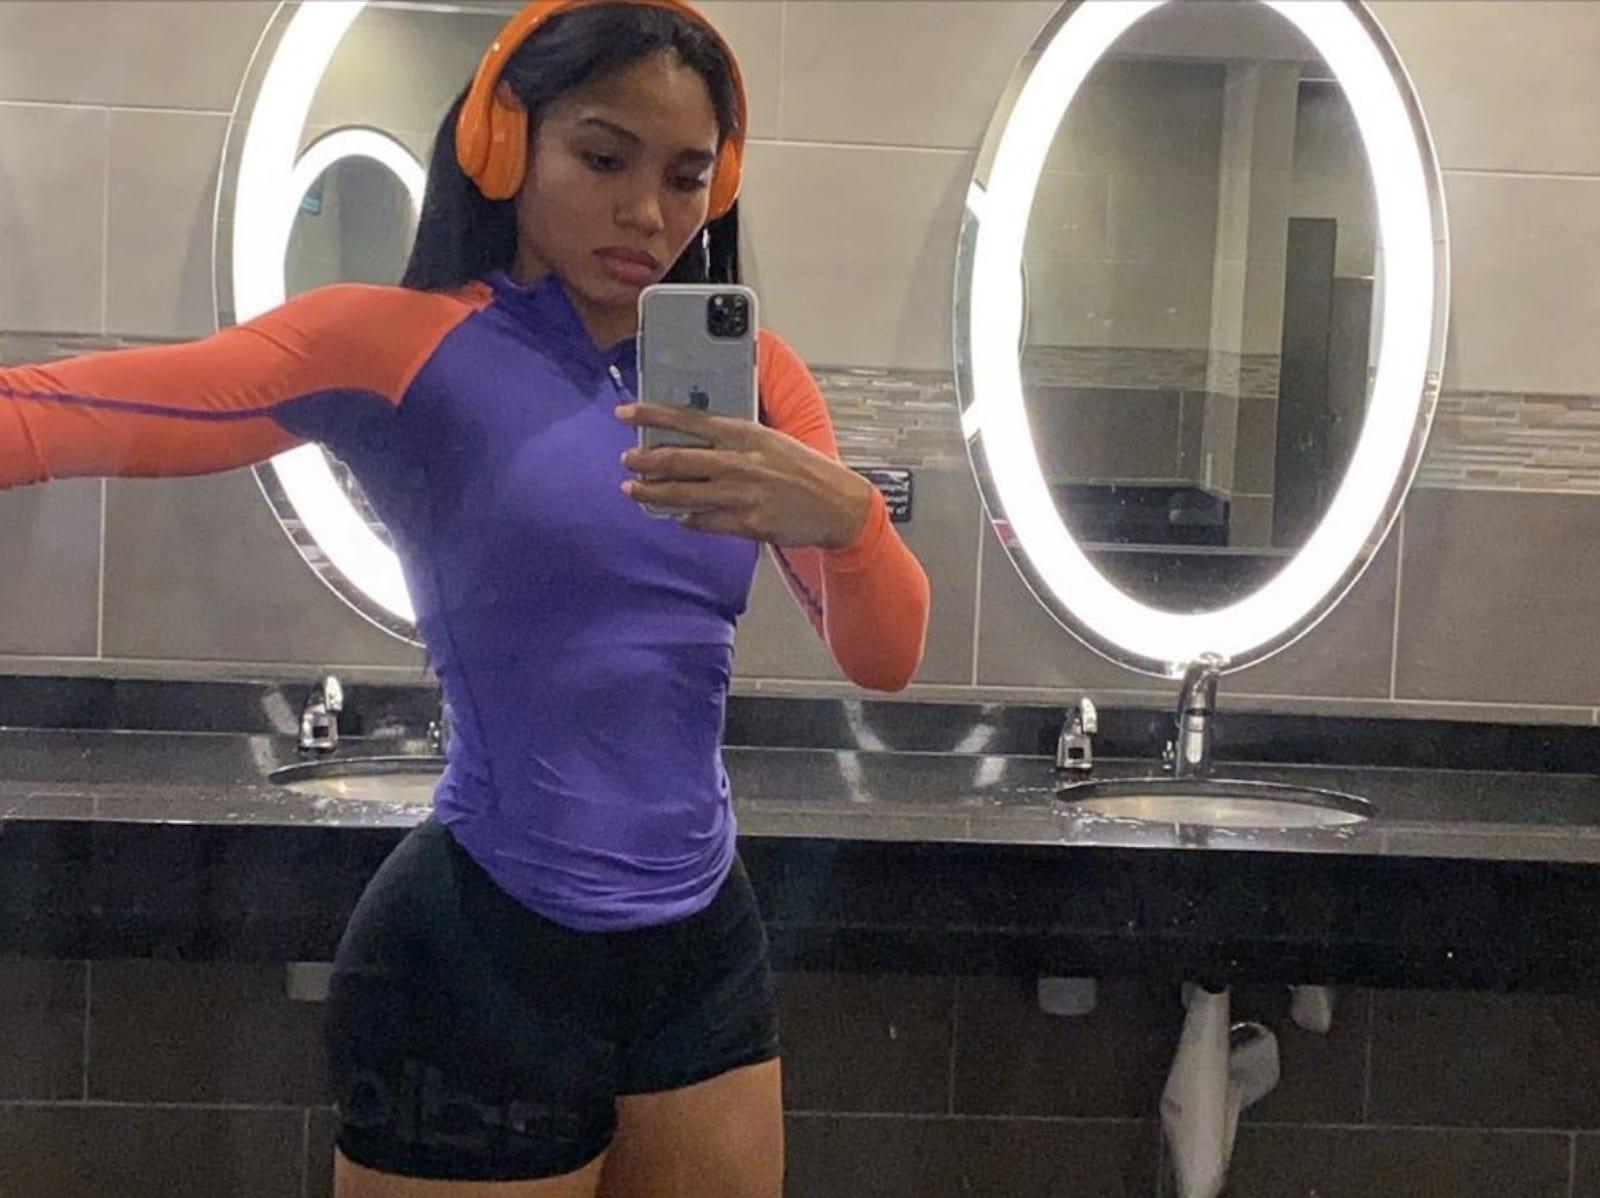 Cuban Link Workout Selfie Pic